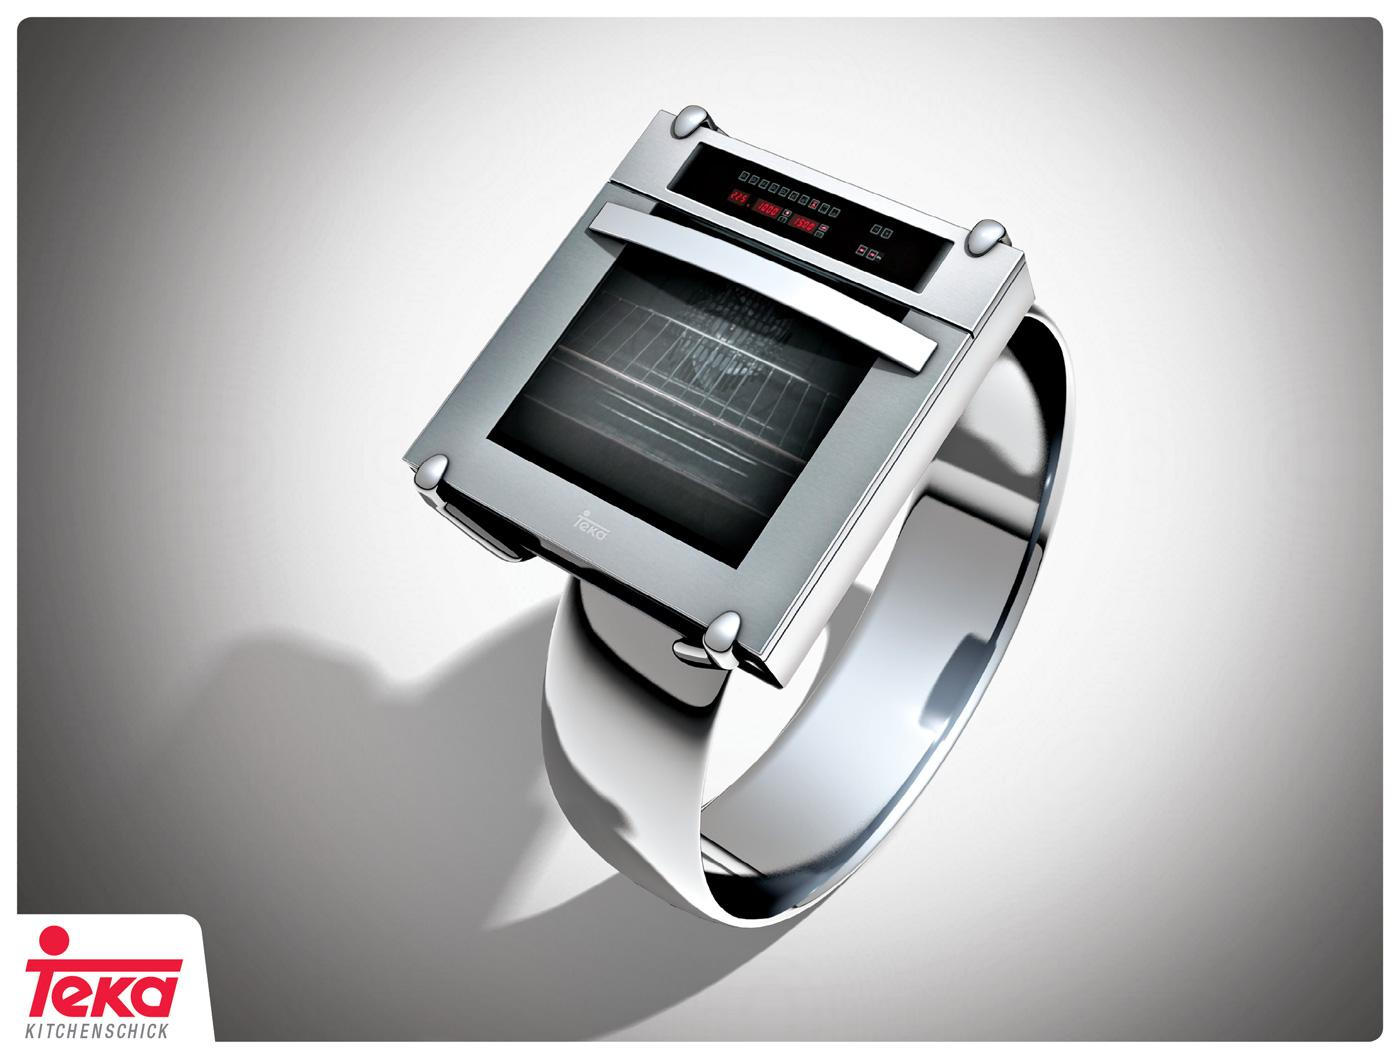 Teka Print Ad -  Jewelry, 3